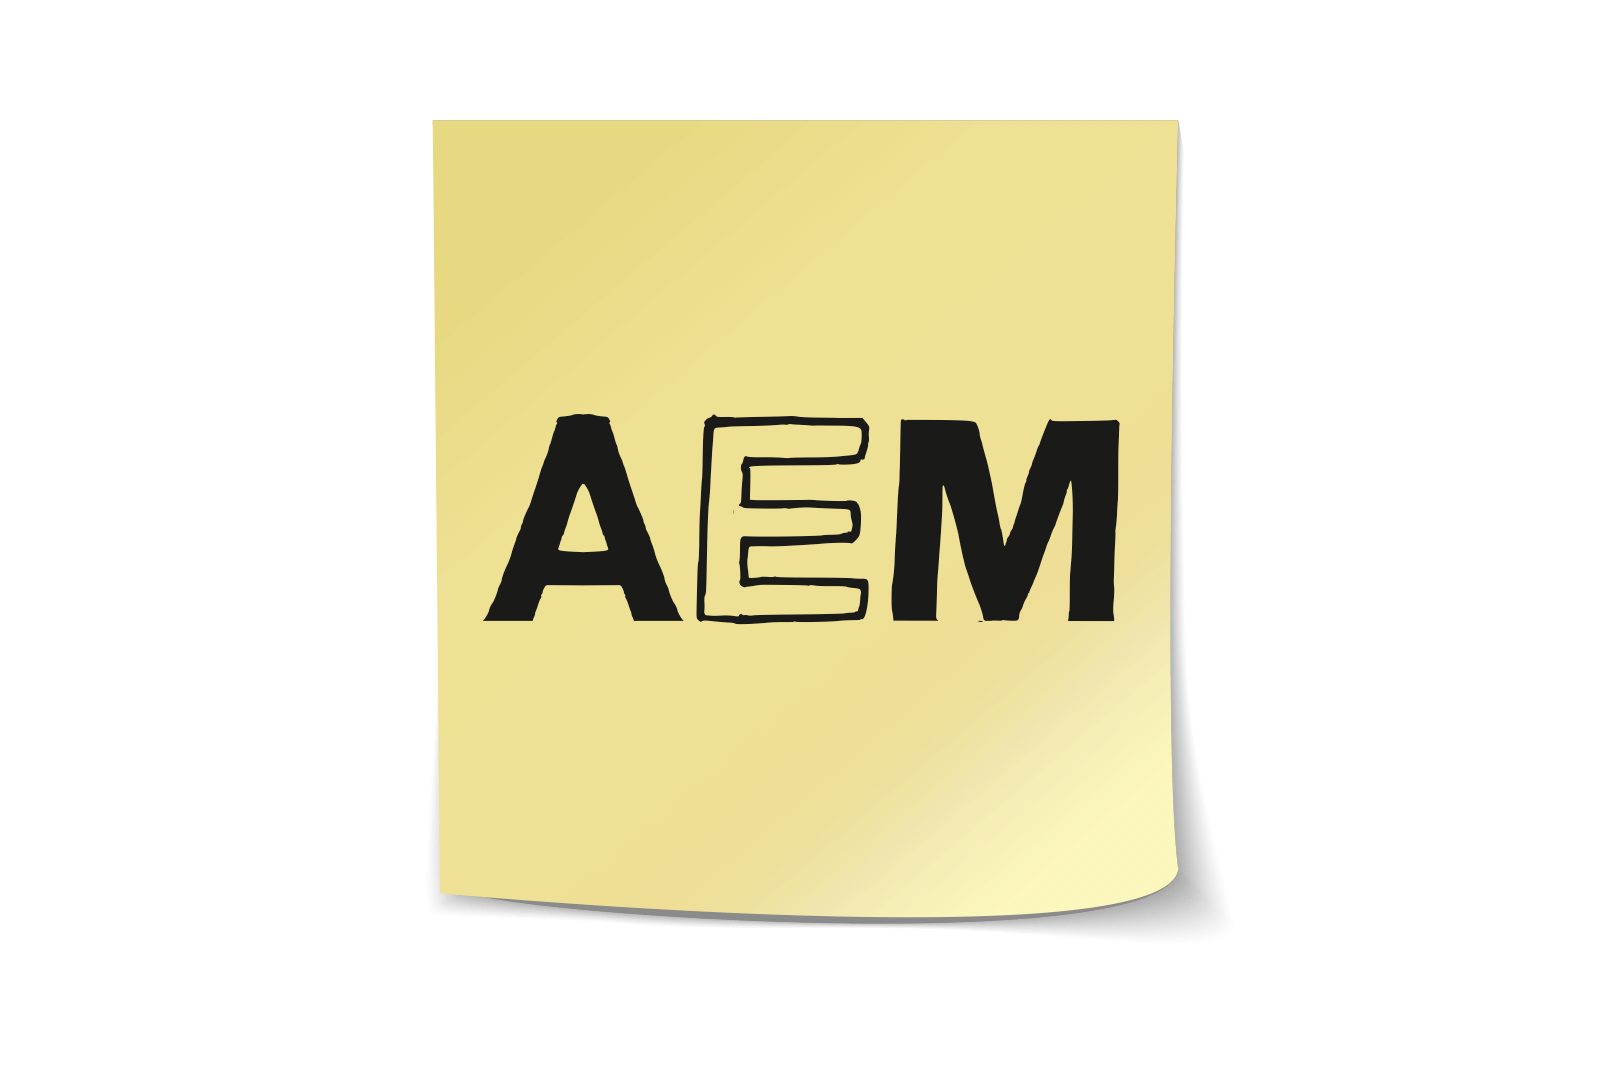 AEMという単語が付箋に書かれている